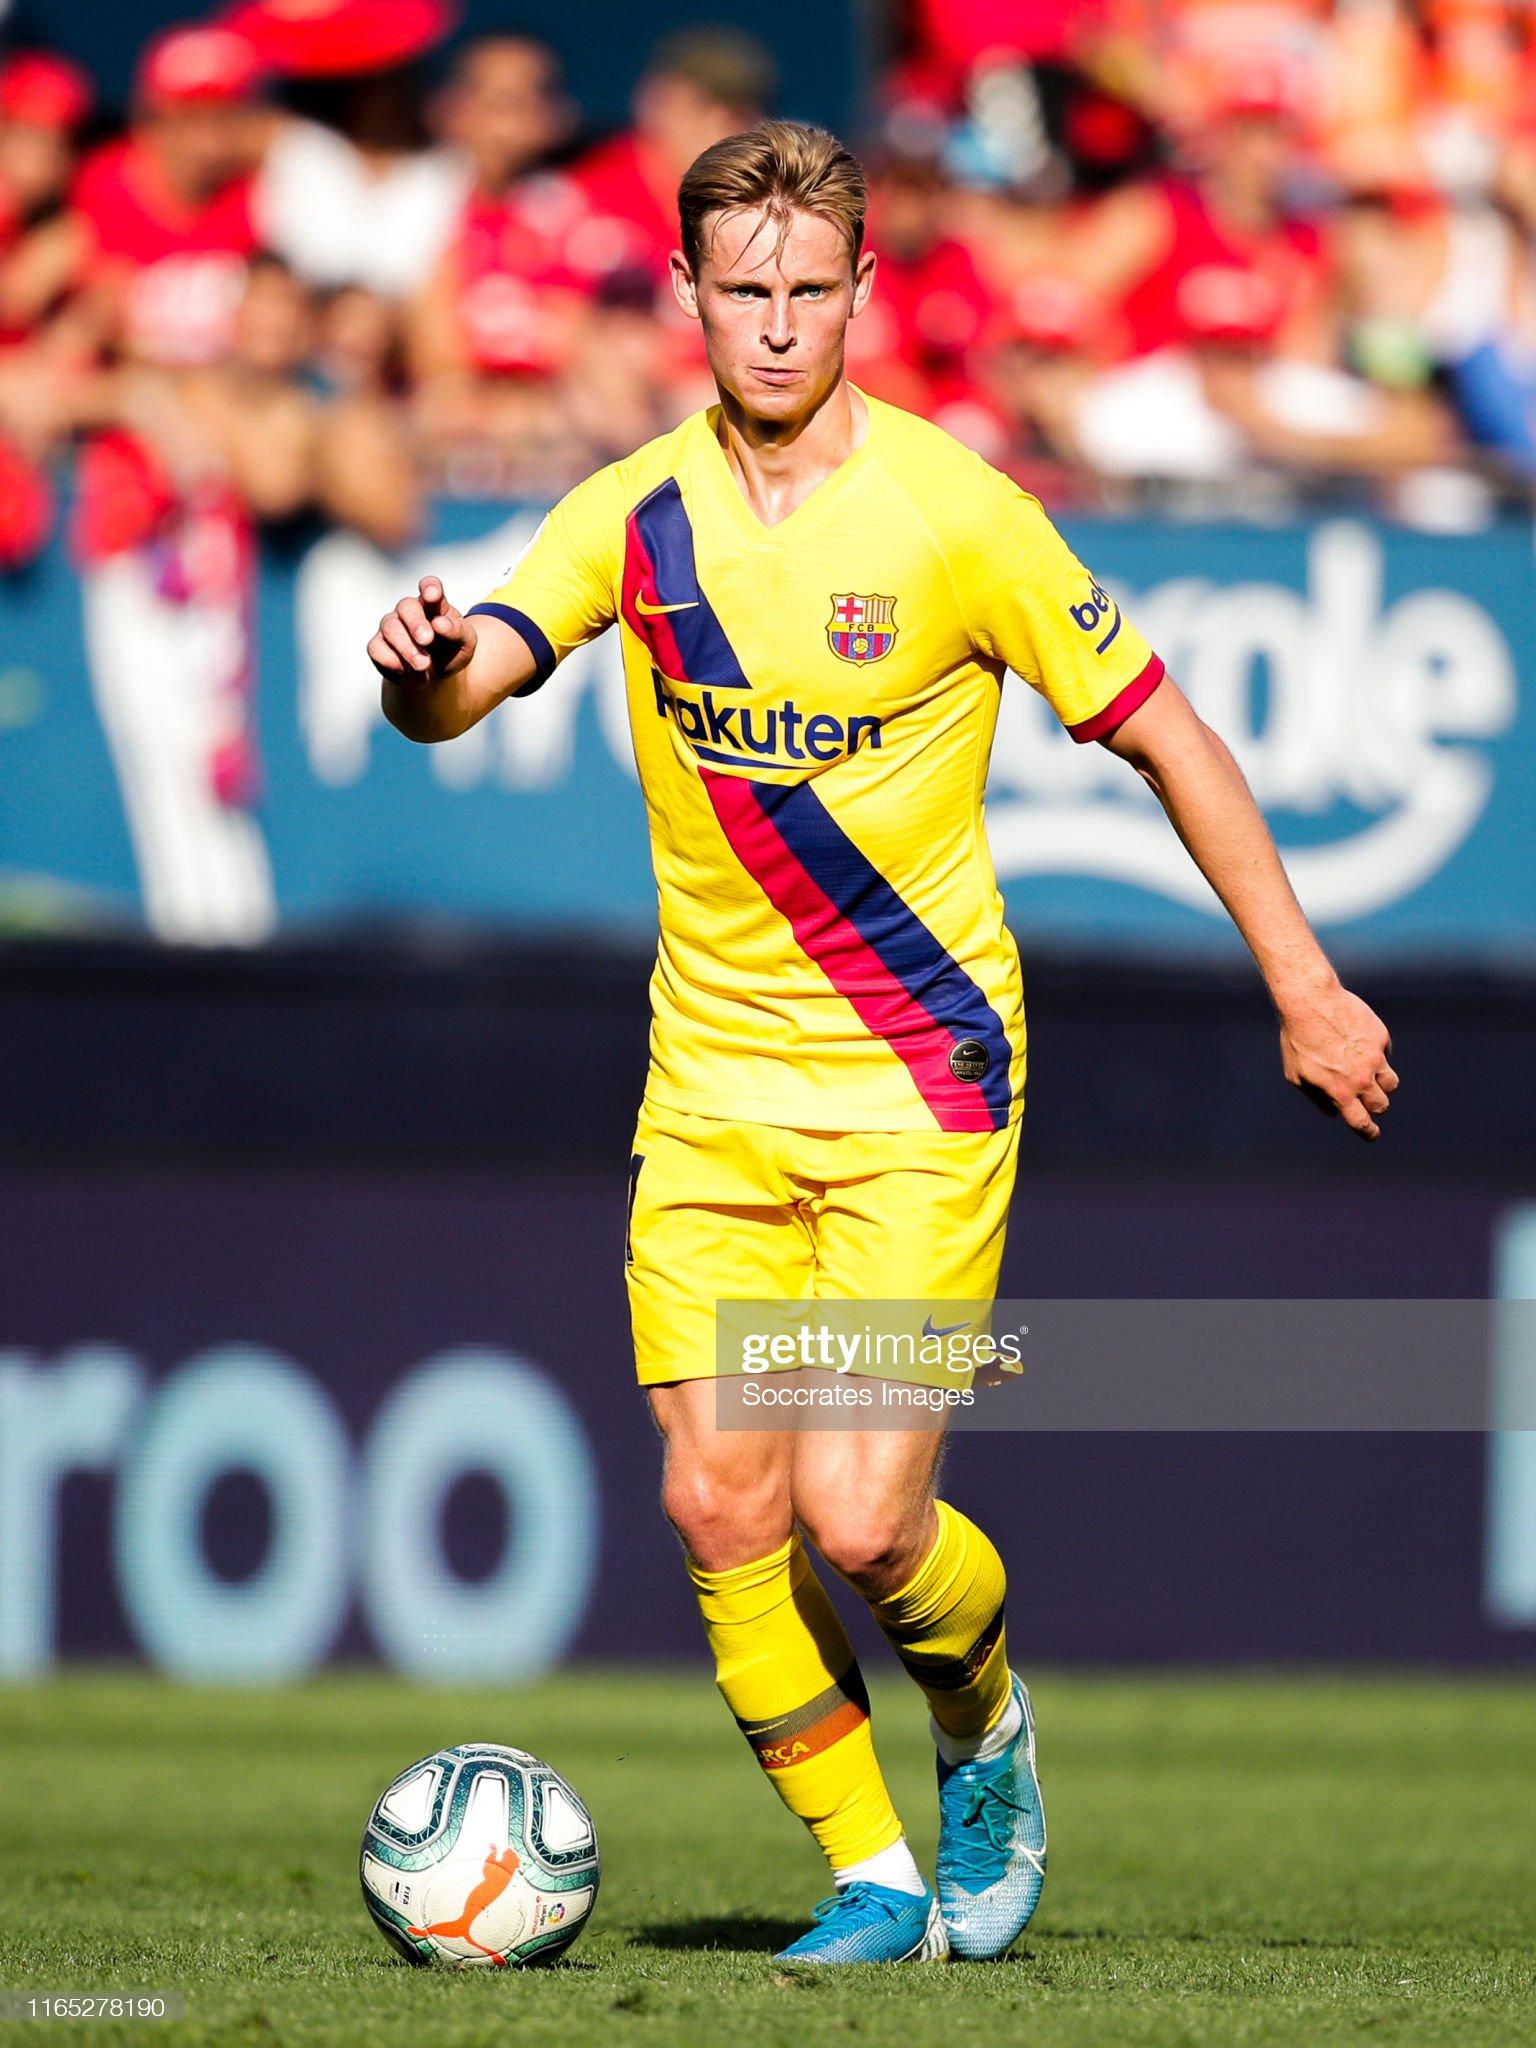 صور مباراة : أوساسونا - برشلونة 2-2 ( 31-08-2019 )  Frenkie-de-jong-of-fc-barcelona-during-the-la-liga-santander-match-picture-id1165278190?s=2048x2048